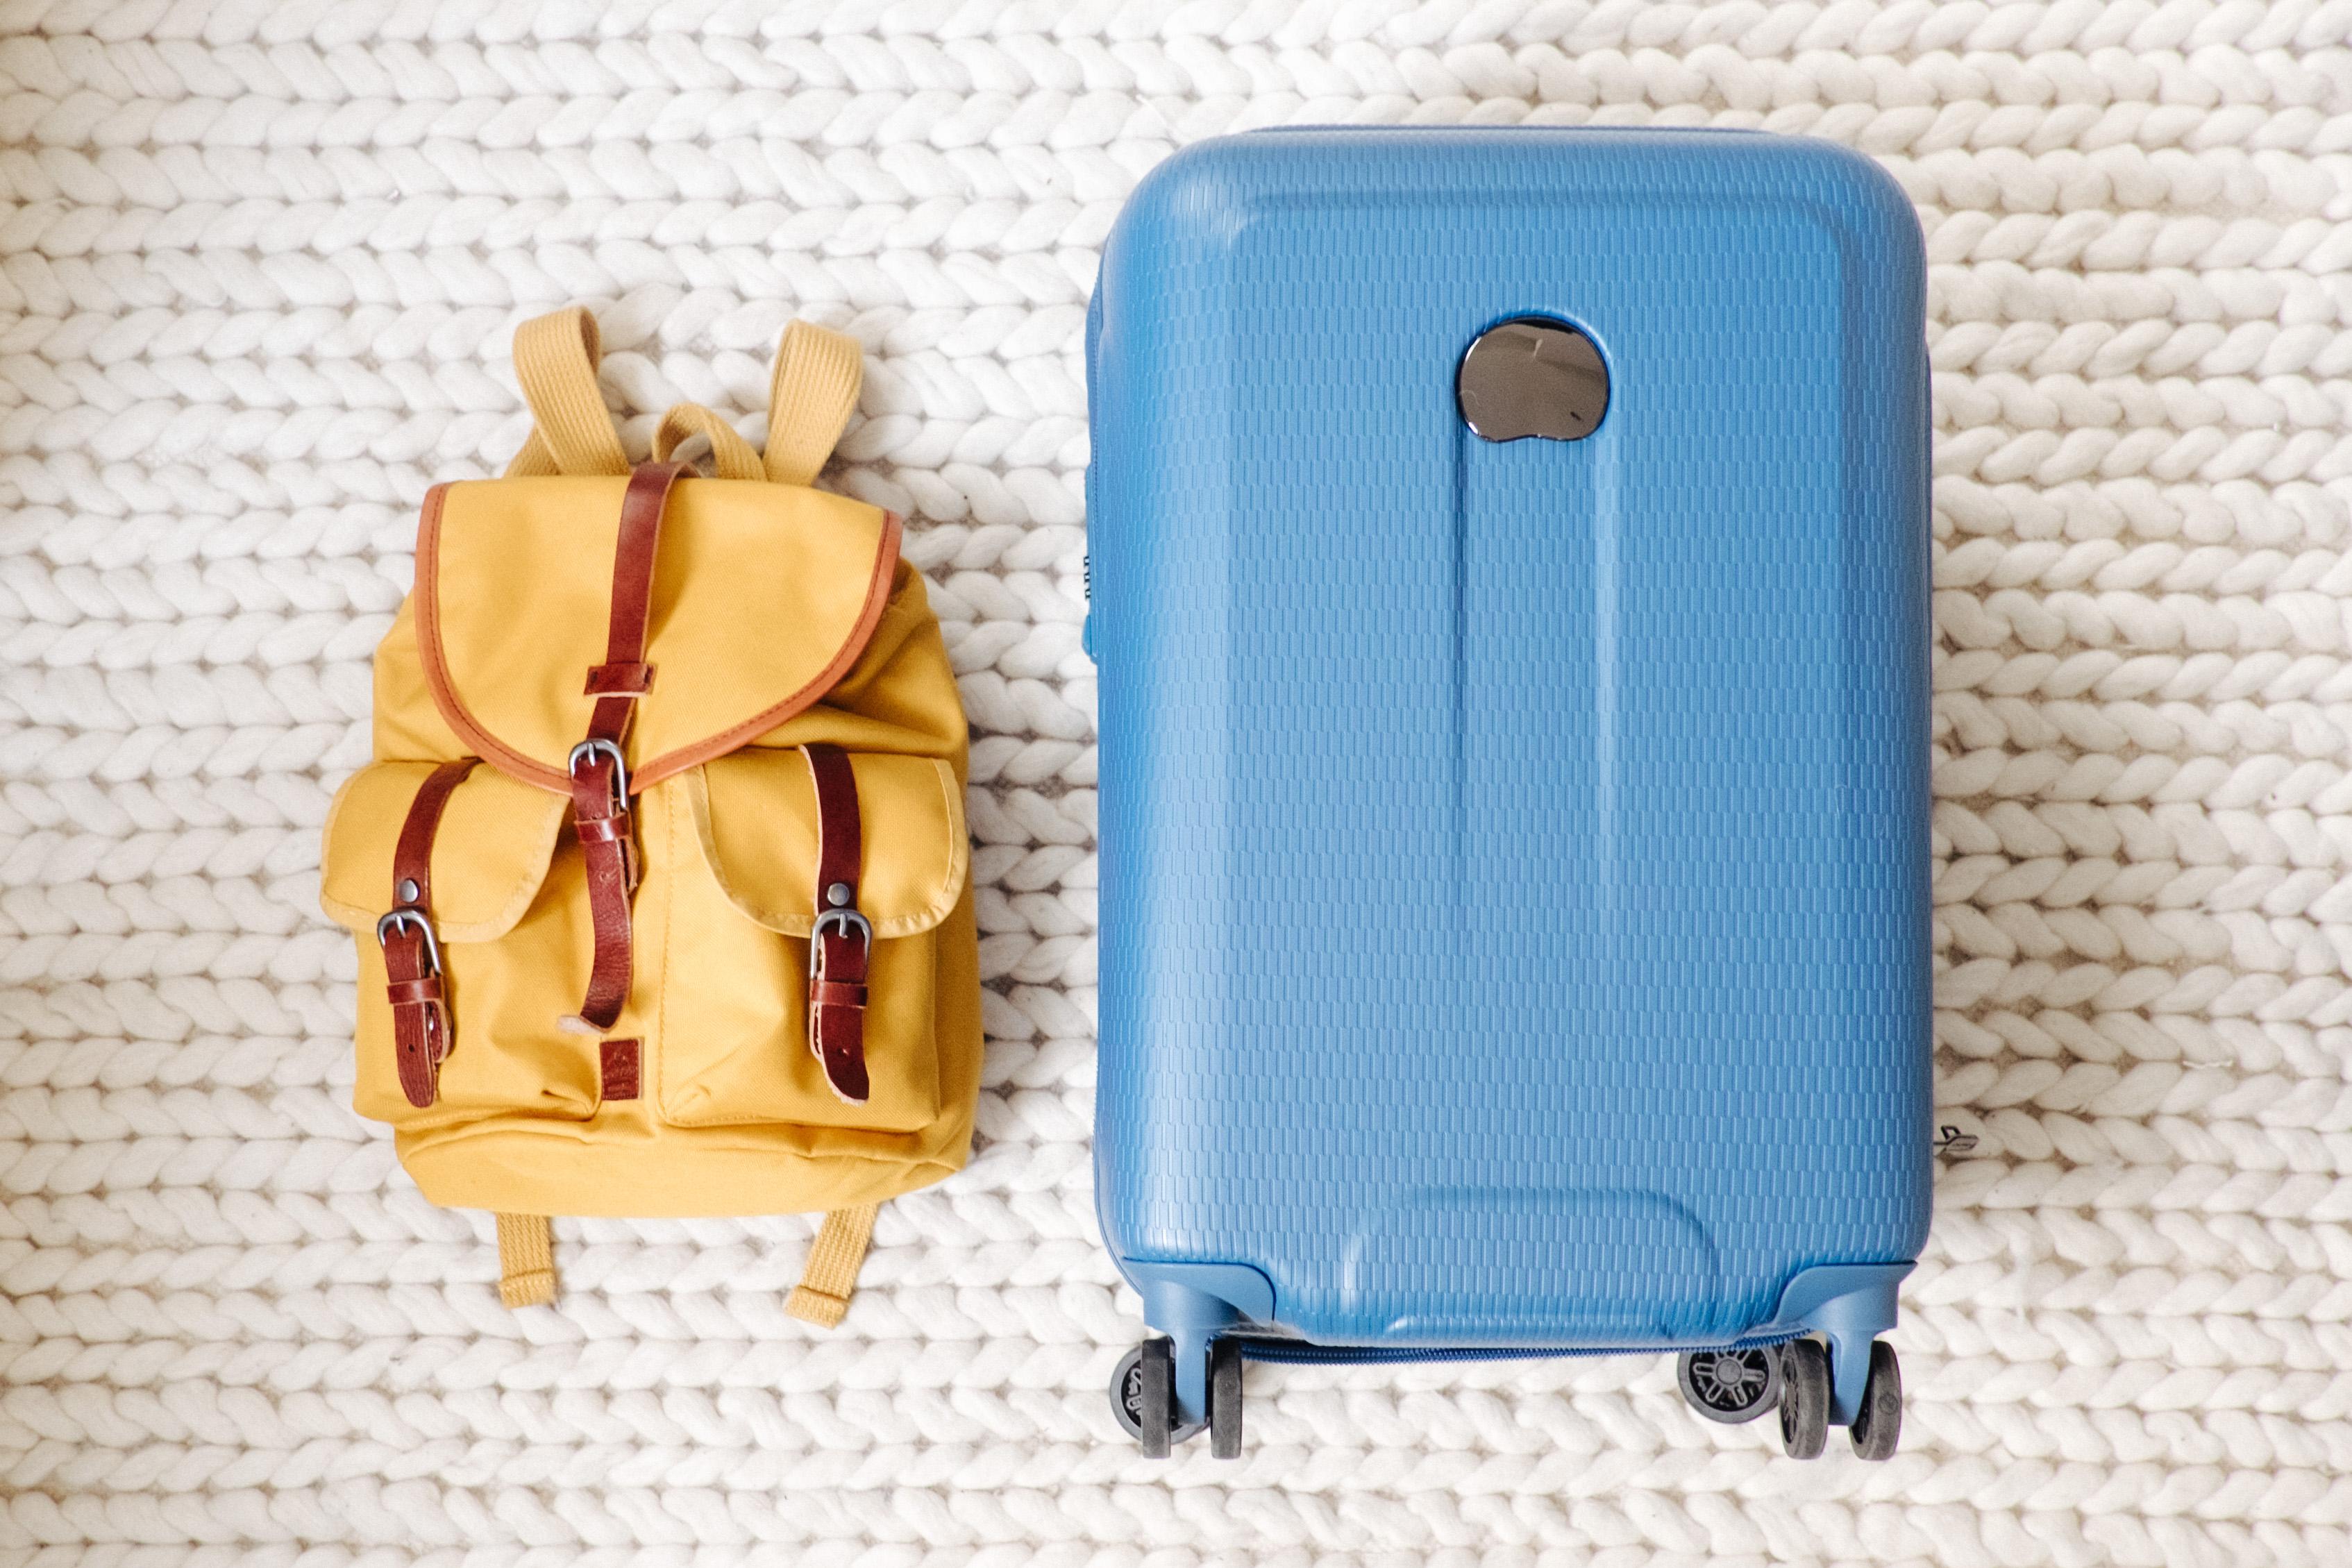 Voyager seulement avec un bagage cabine   Eleonore Bridge 68e59180e166